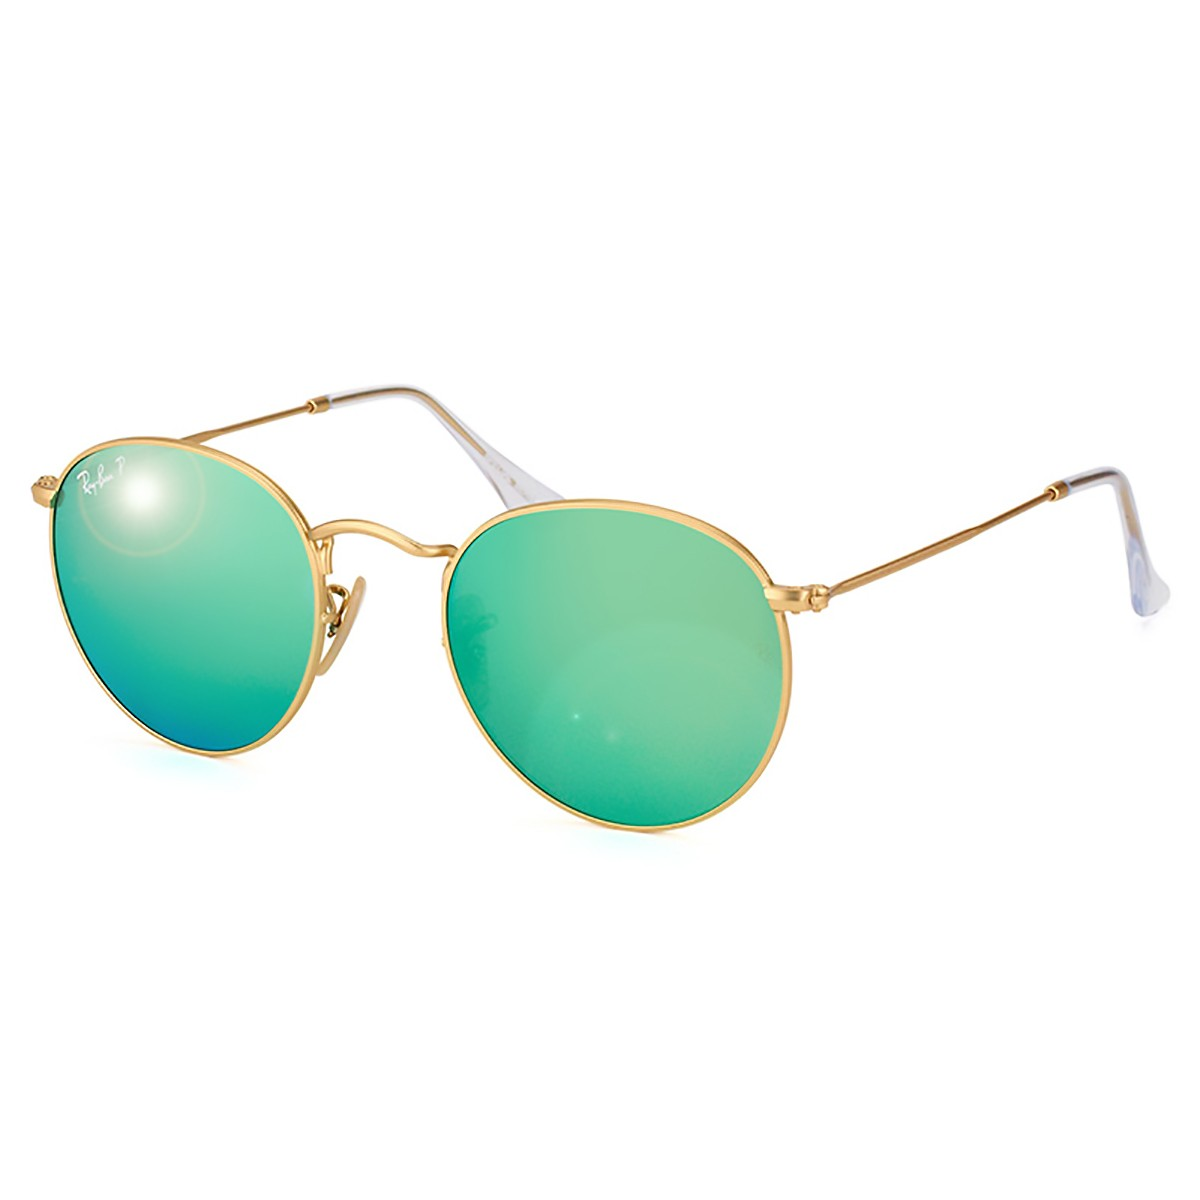 Compre Óculos de Sol Ray Ban Round Metal em 10X   Tri-Jóia Shop 337955c482